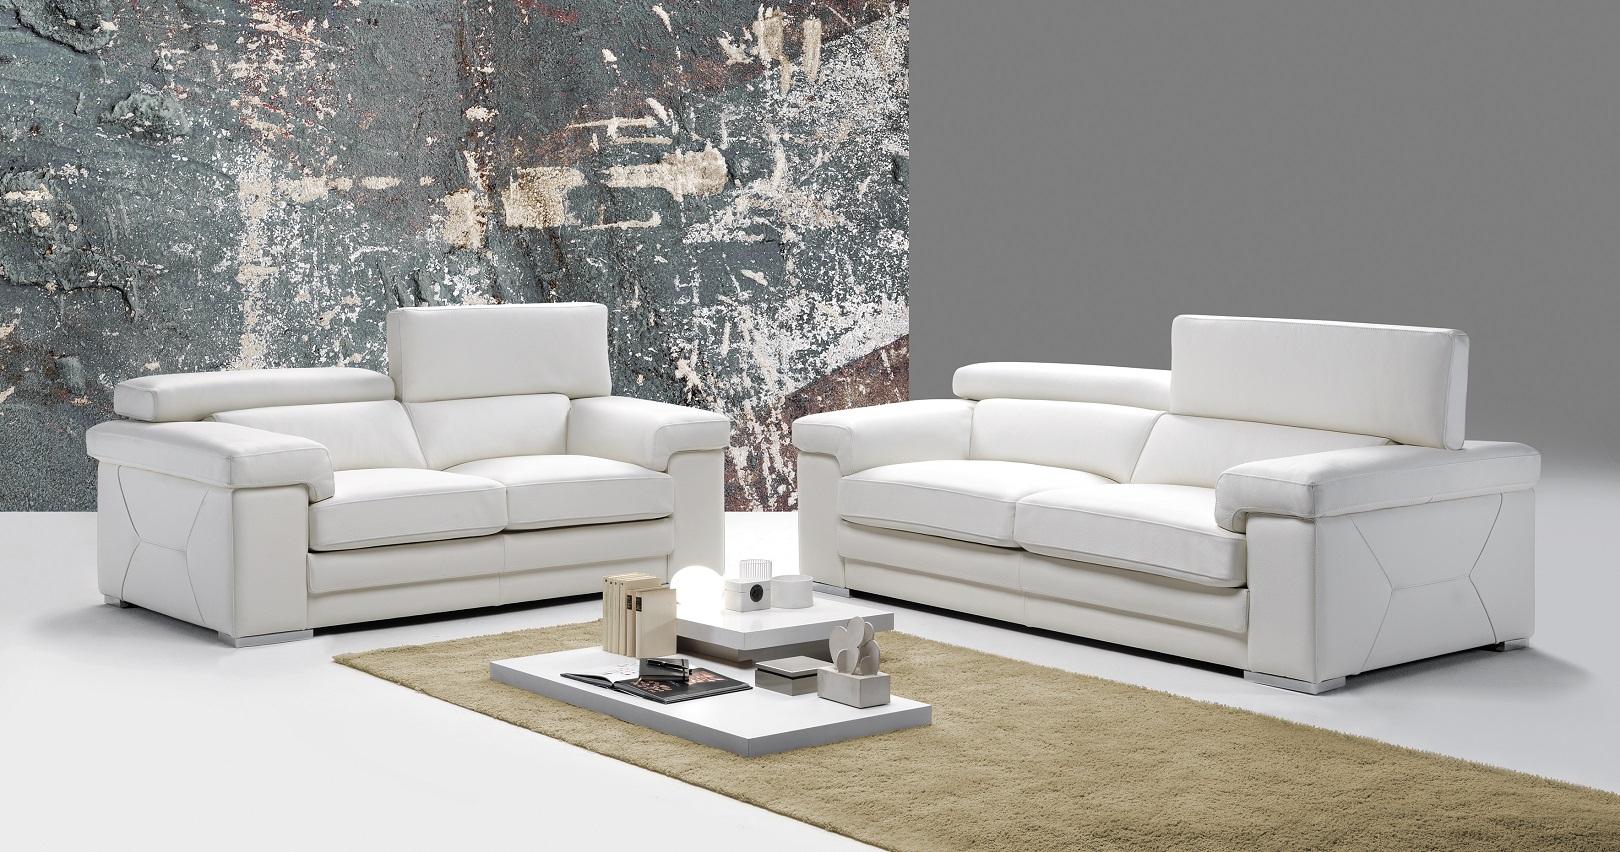 Laveno Design Italien Cuir Épais concernant Canape Cuir Blanc